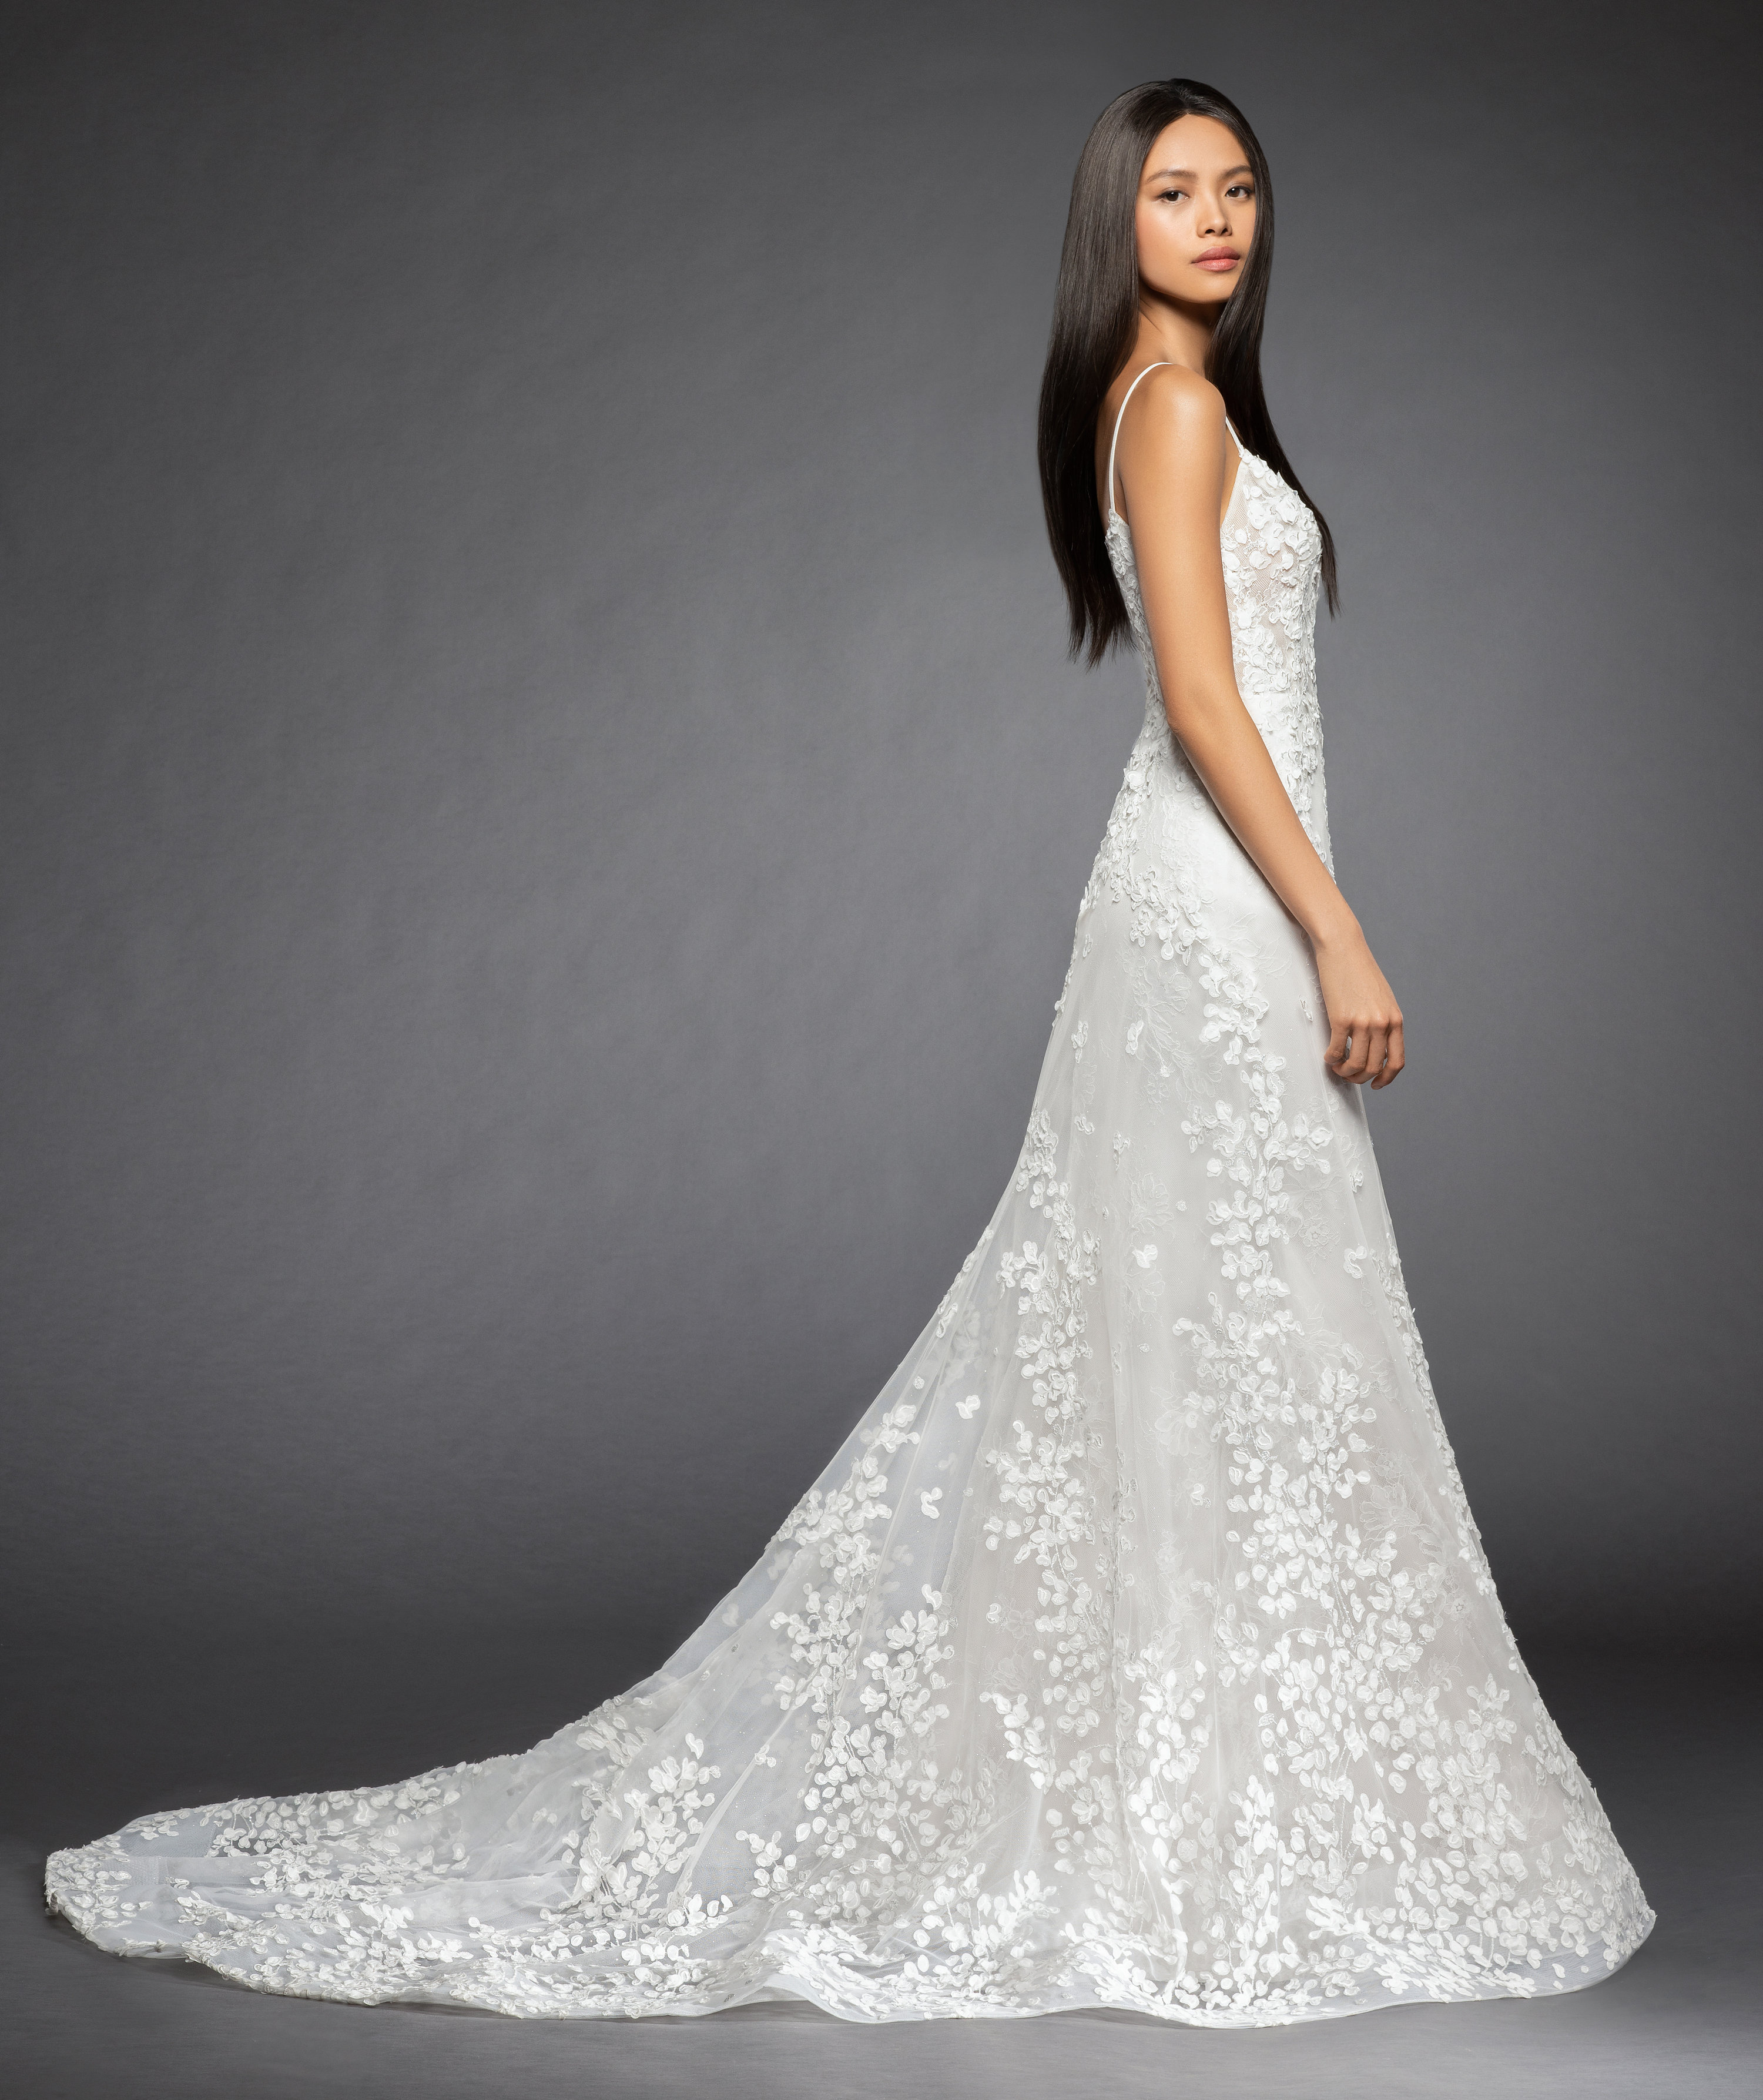 Spaghetti Strap Floral Applique A-line Wedding Dress | Kleinfeld Bridal